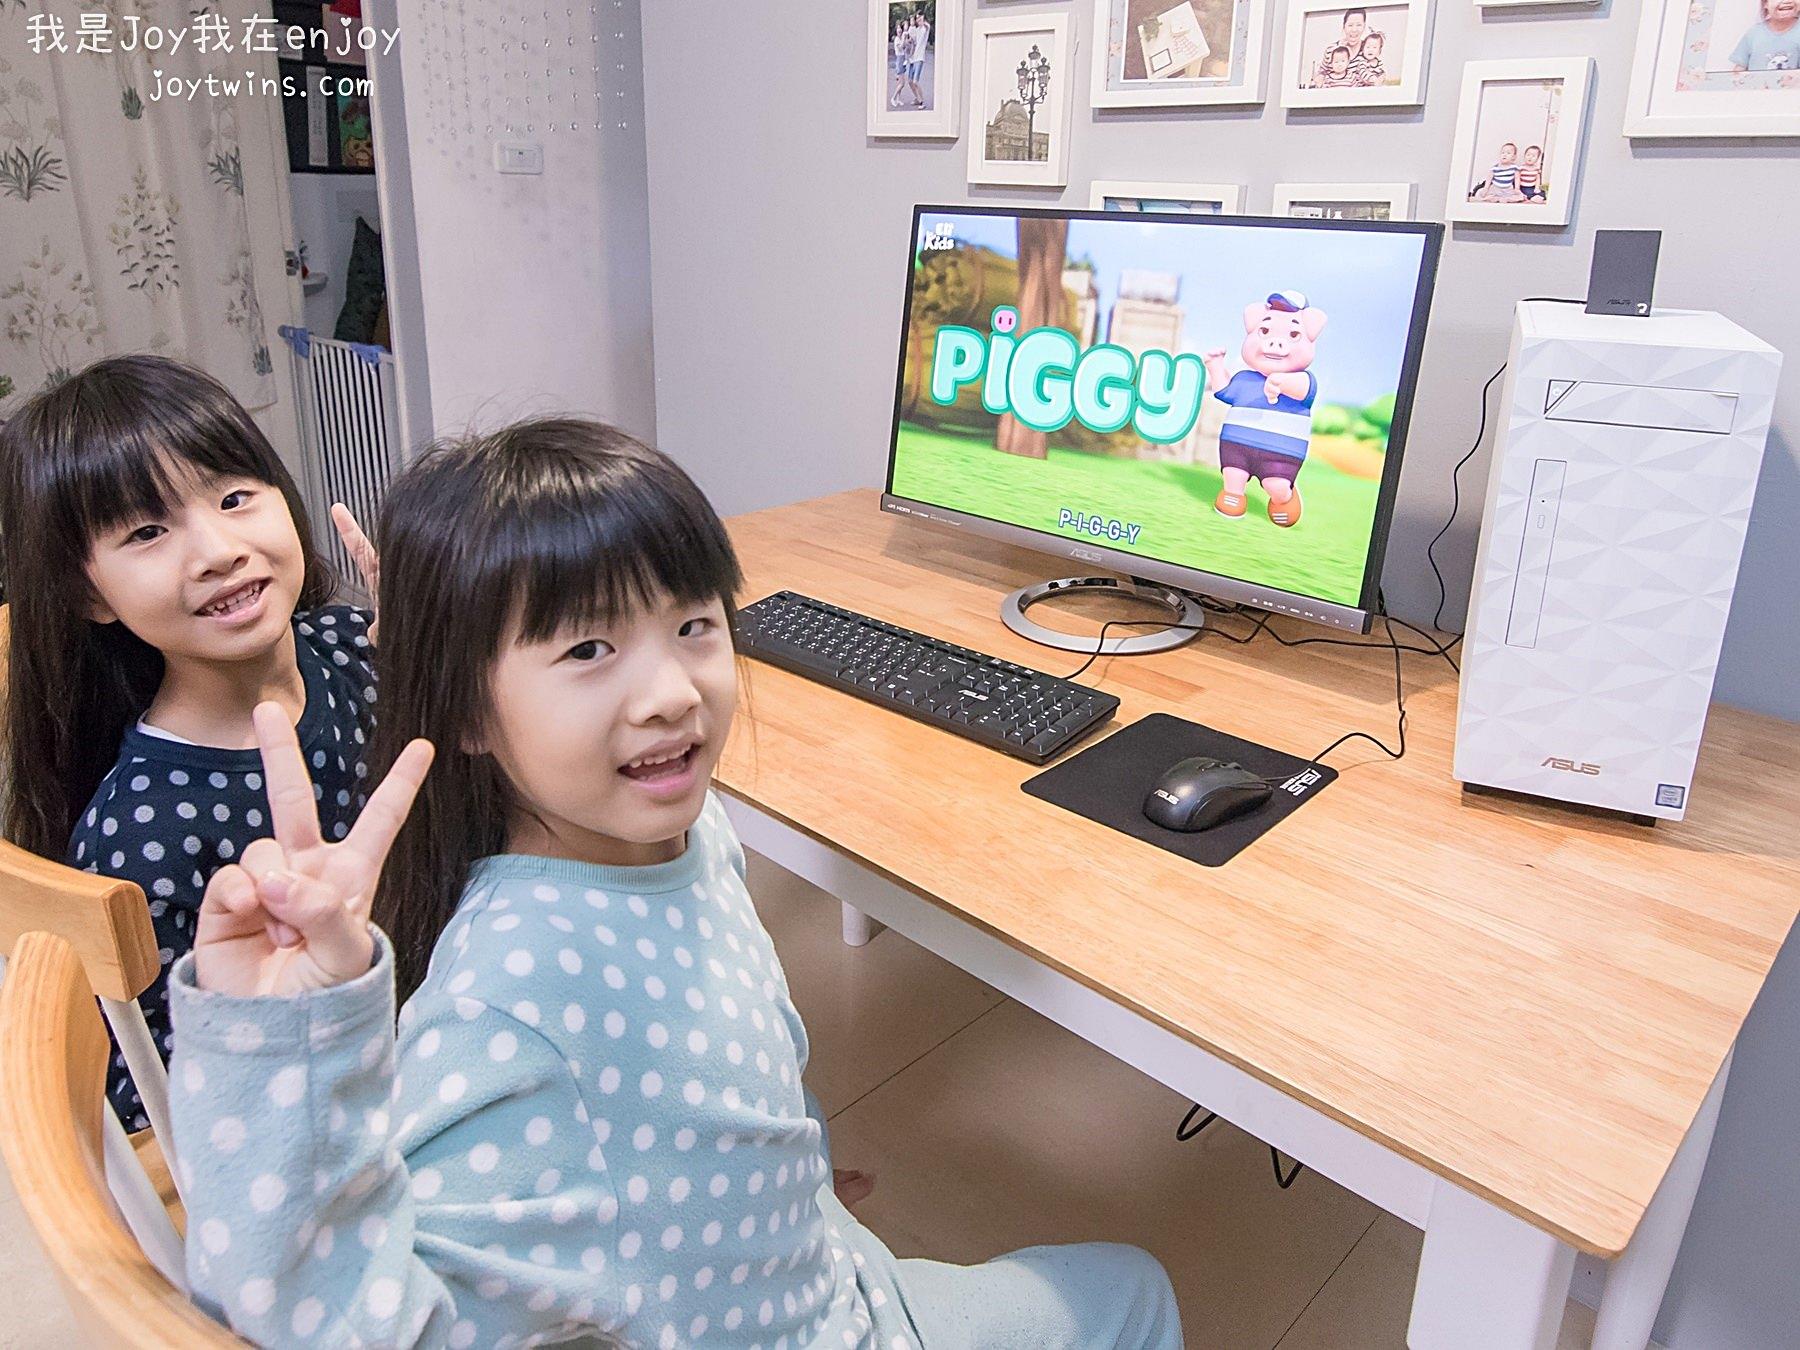 ASUS S340MF 超美型時尚電腦 家用電腦也能美貌功能兼具